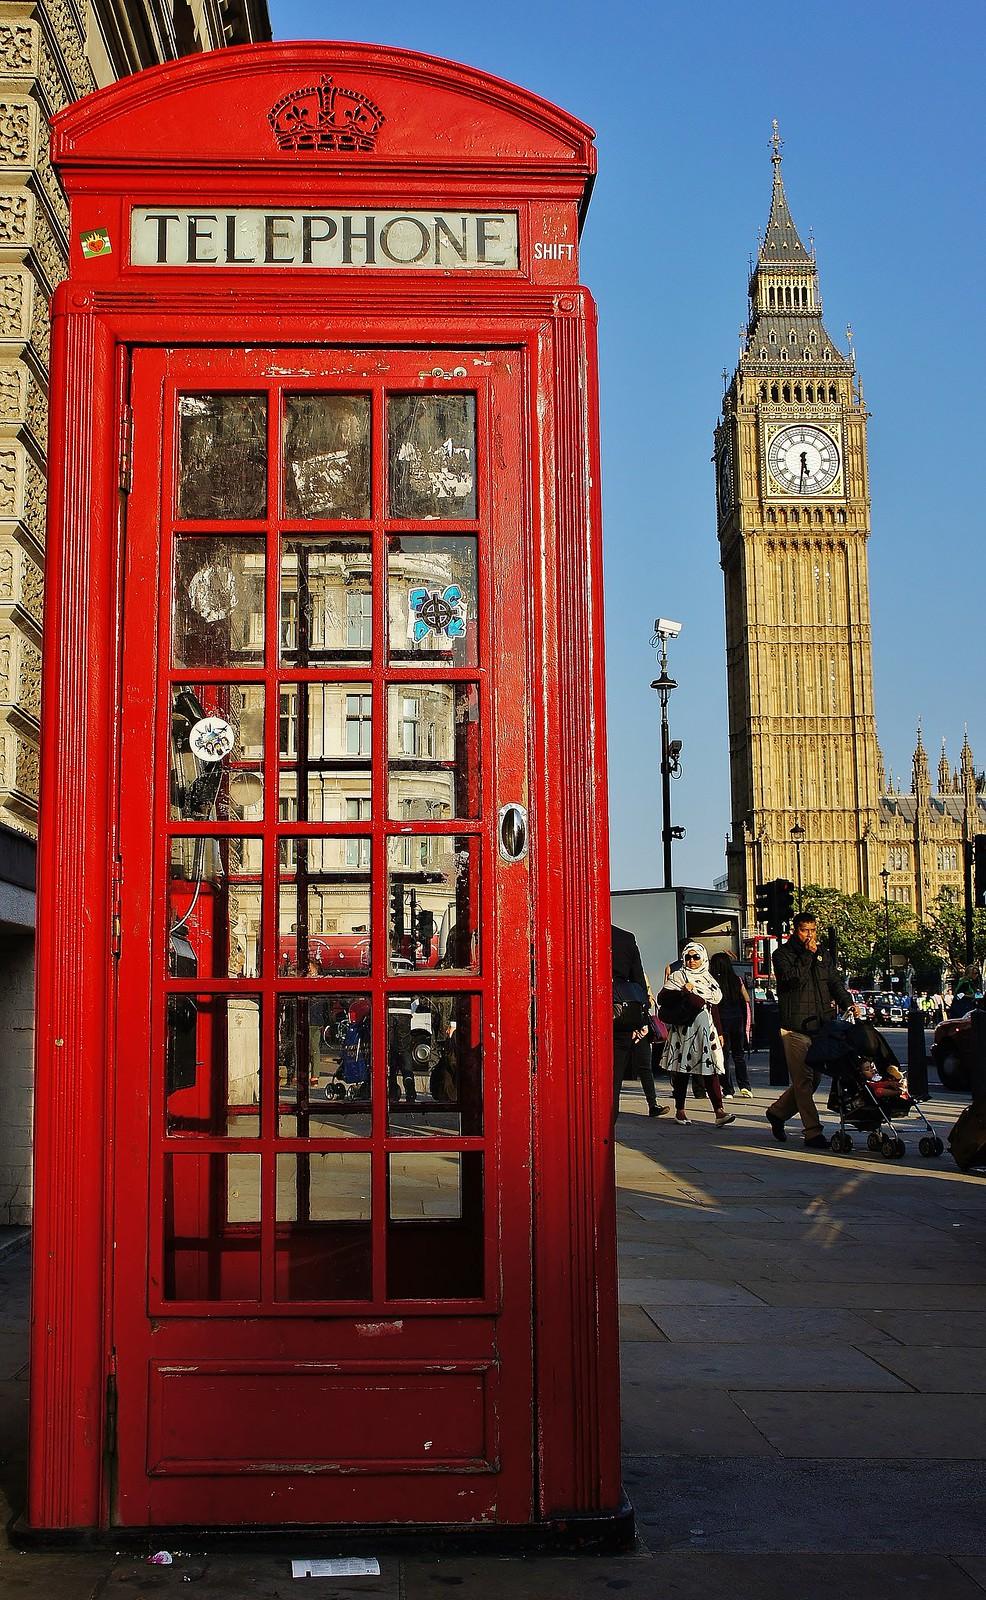 London Telephone Box-Booth